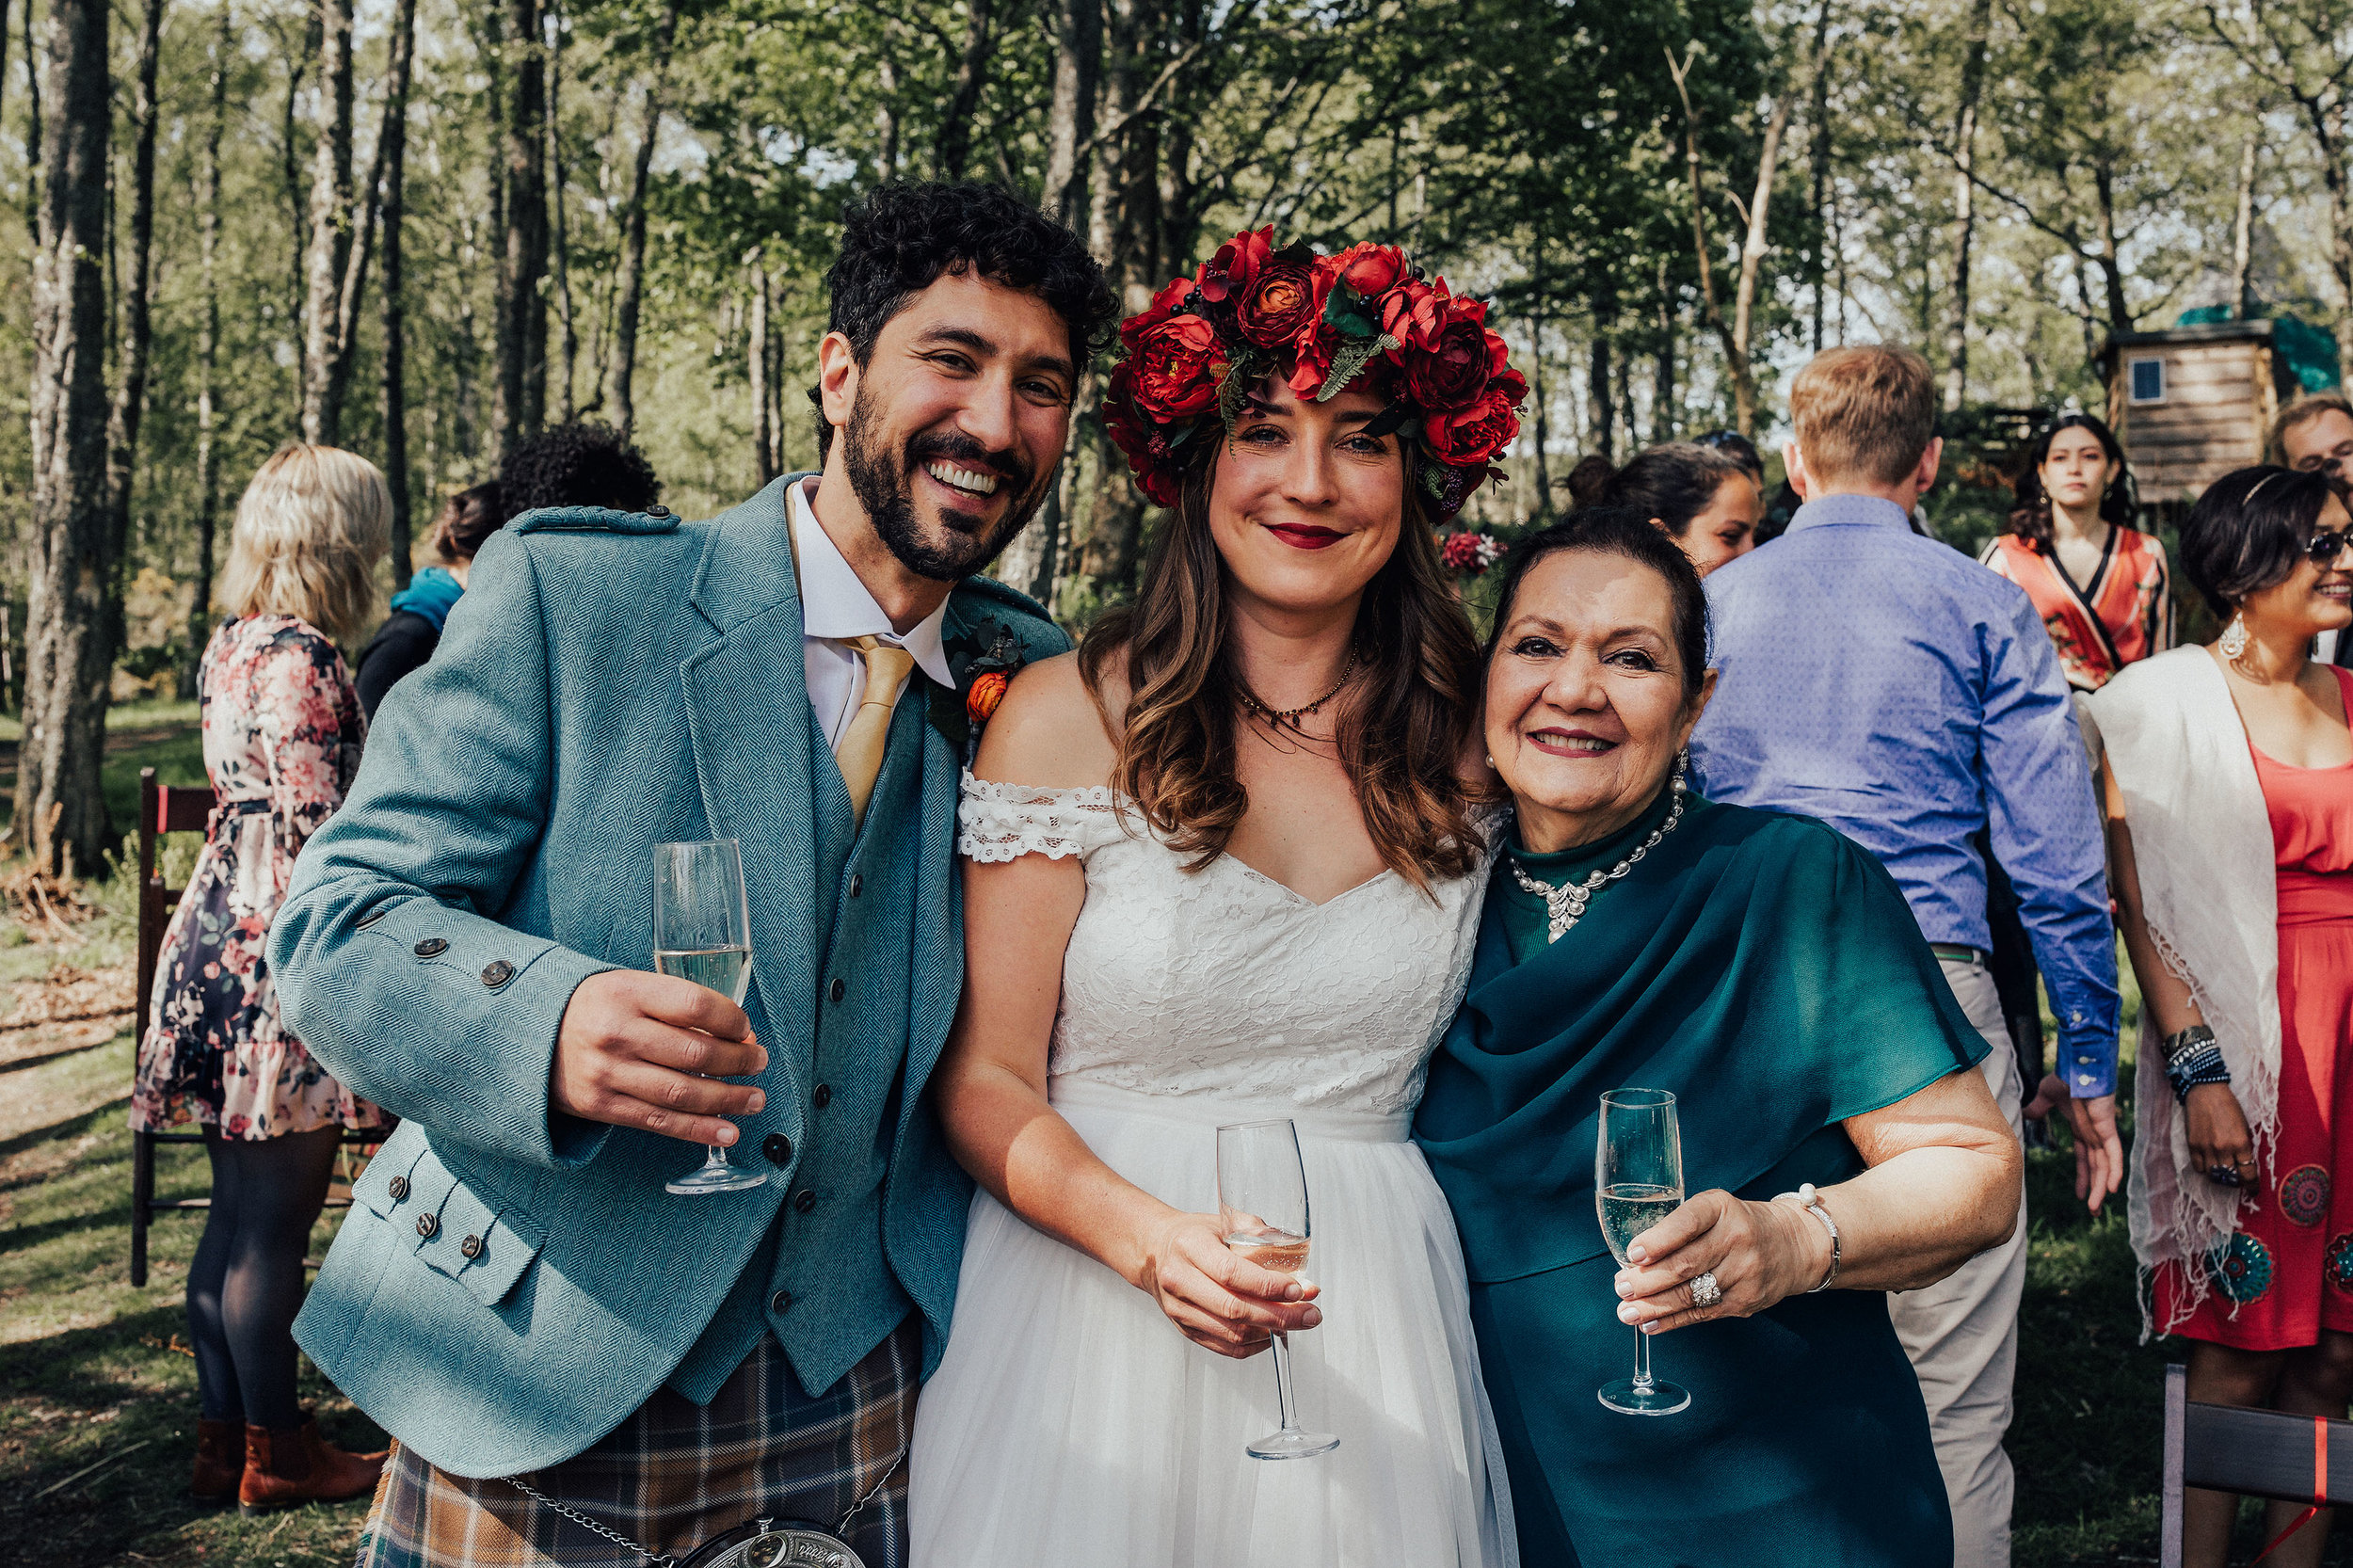 COMRIE_CROFT_WEDDINGS_PJ_PHILLIPS_PHOTOGRAPHY_94.jpg